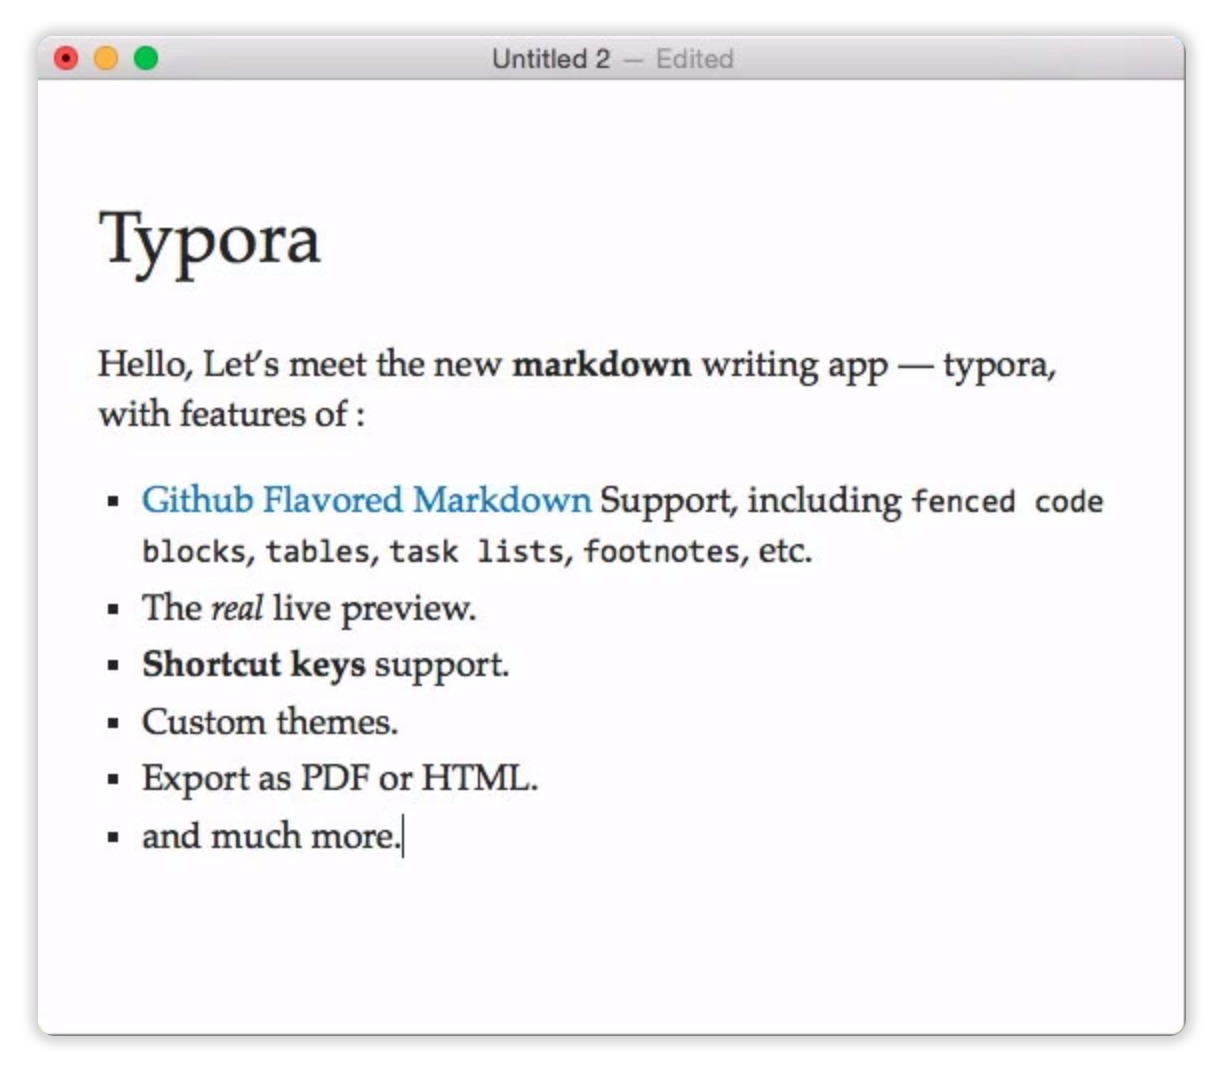 Typora 0 9 9 8 8 – Minimalist Markdown editor (beta